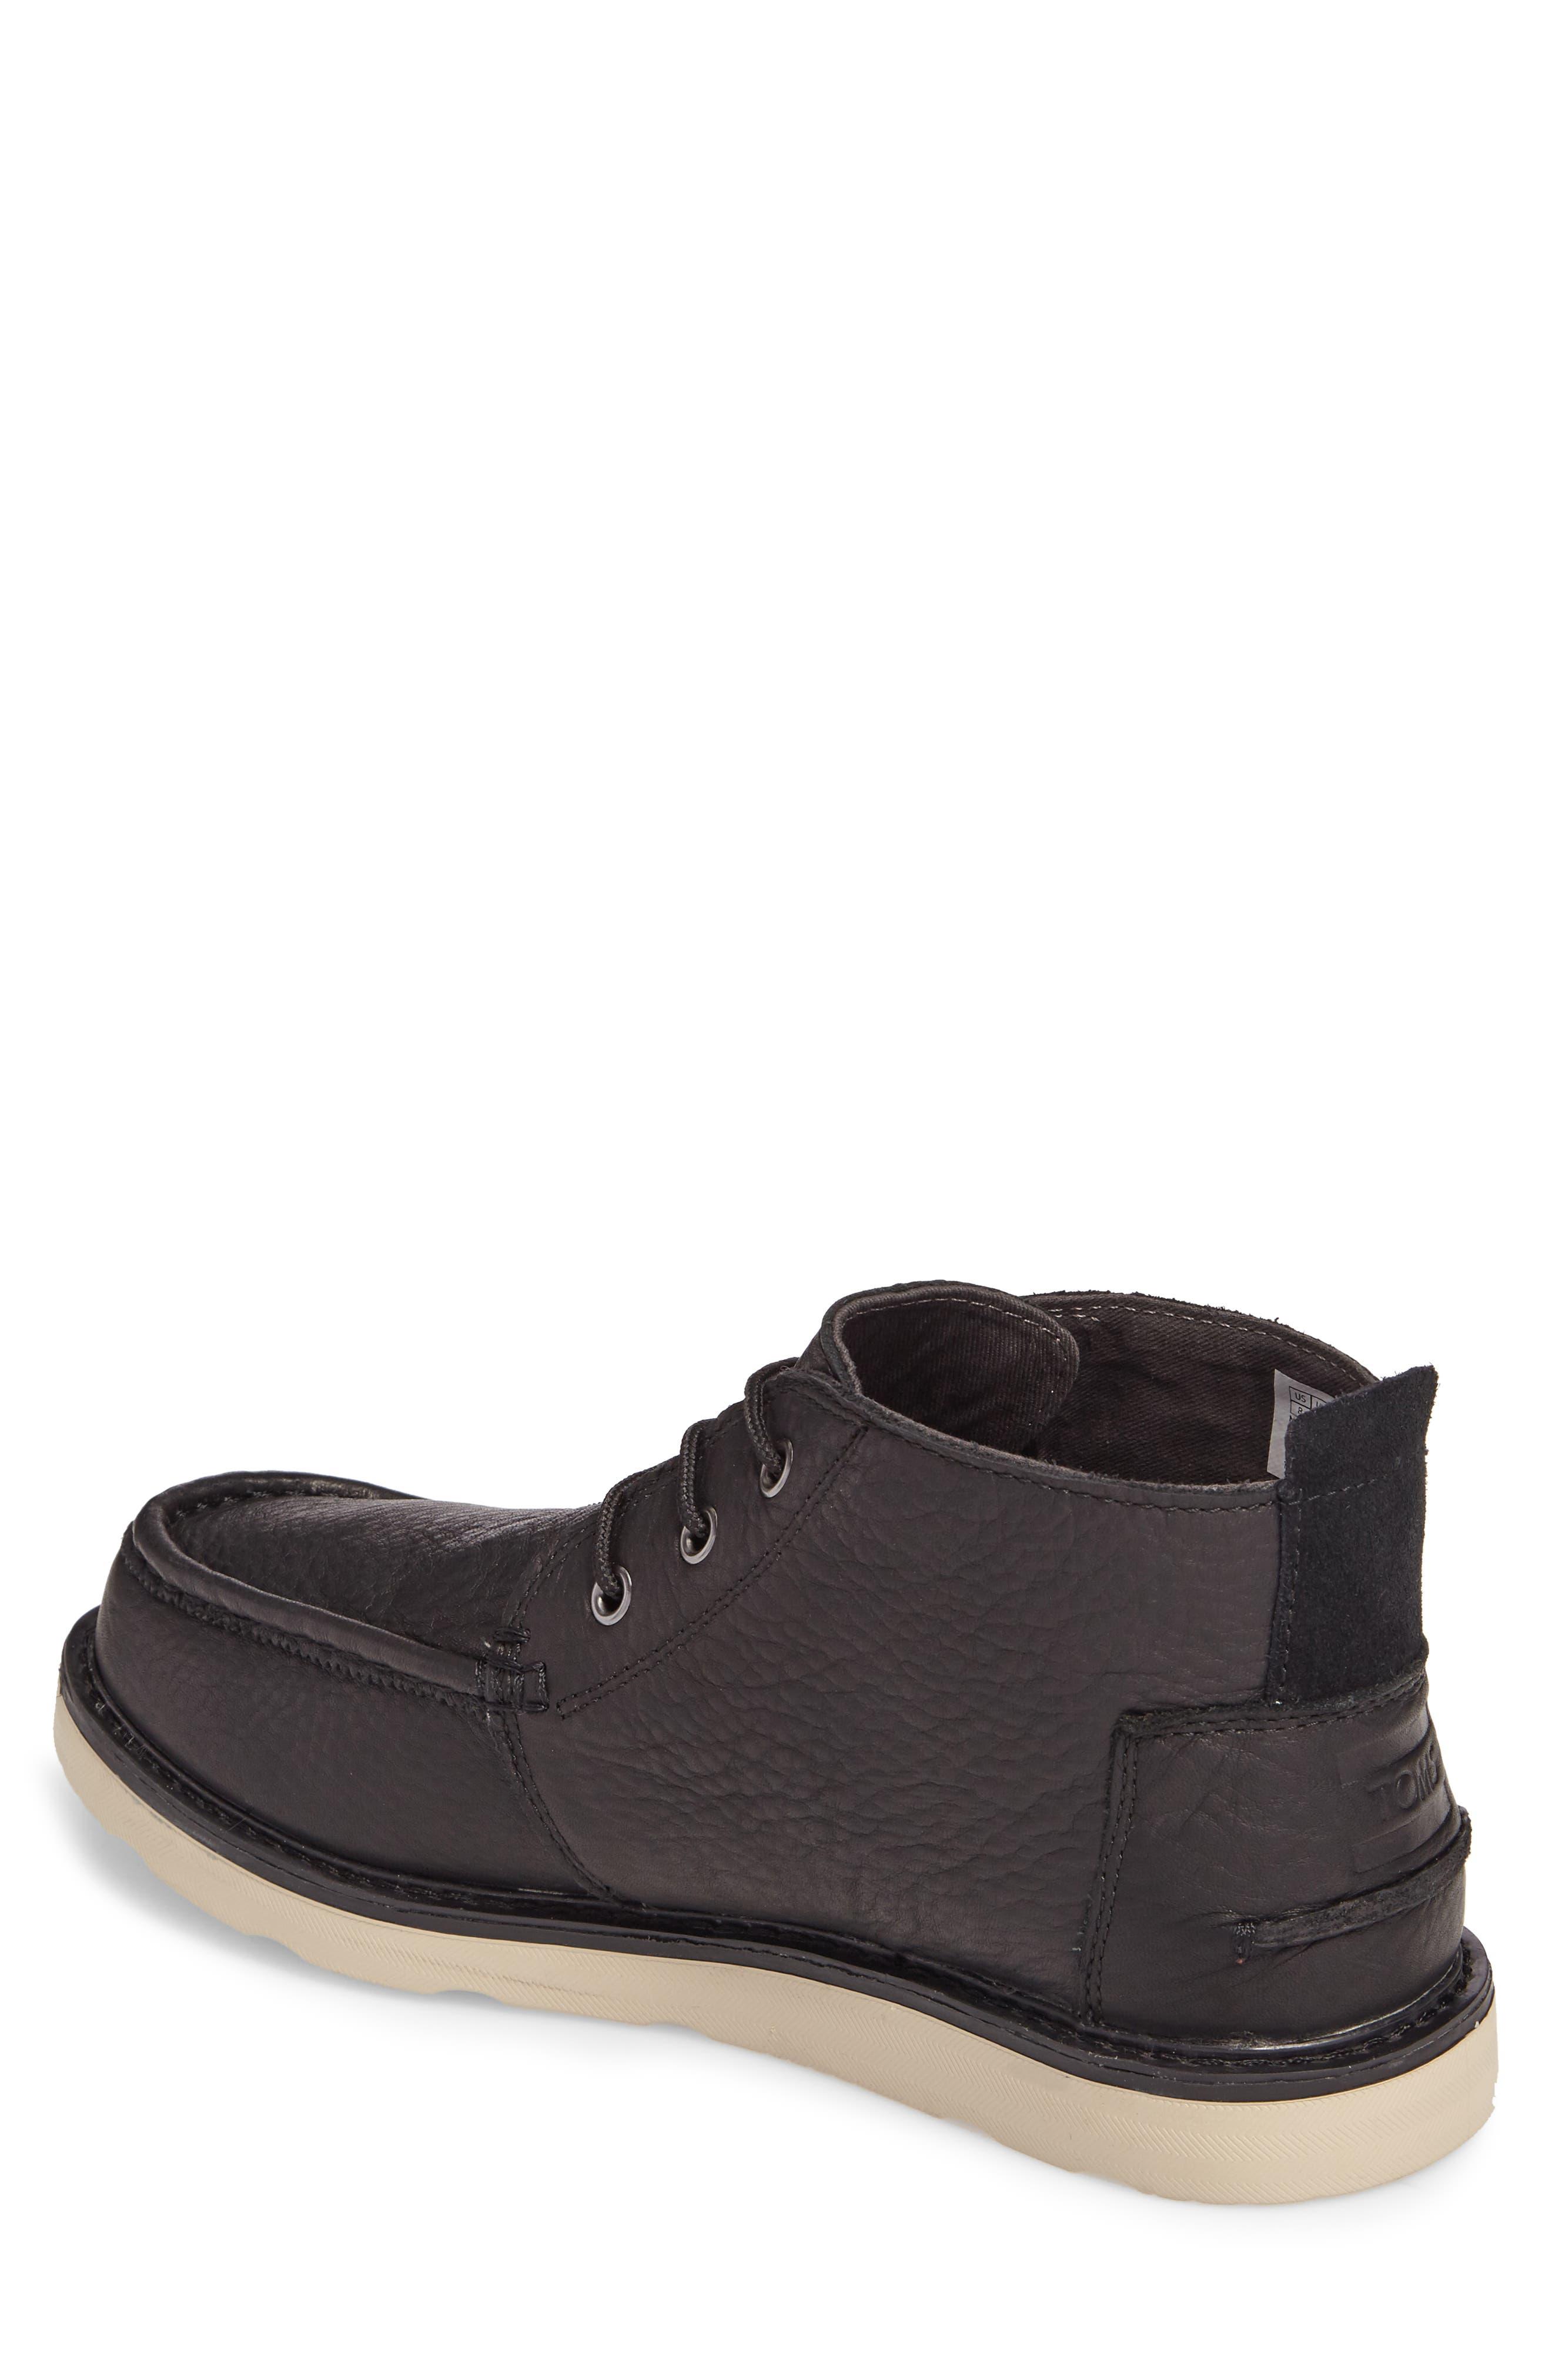 Chukka Boot,                             Alternate thumbnail 2, color,                             Black/Black Leather